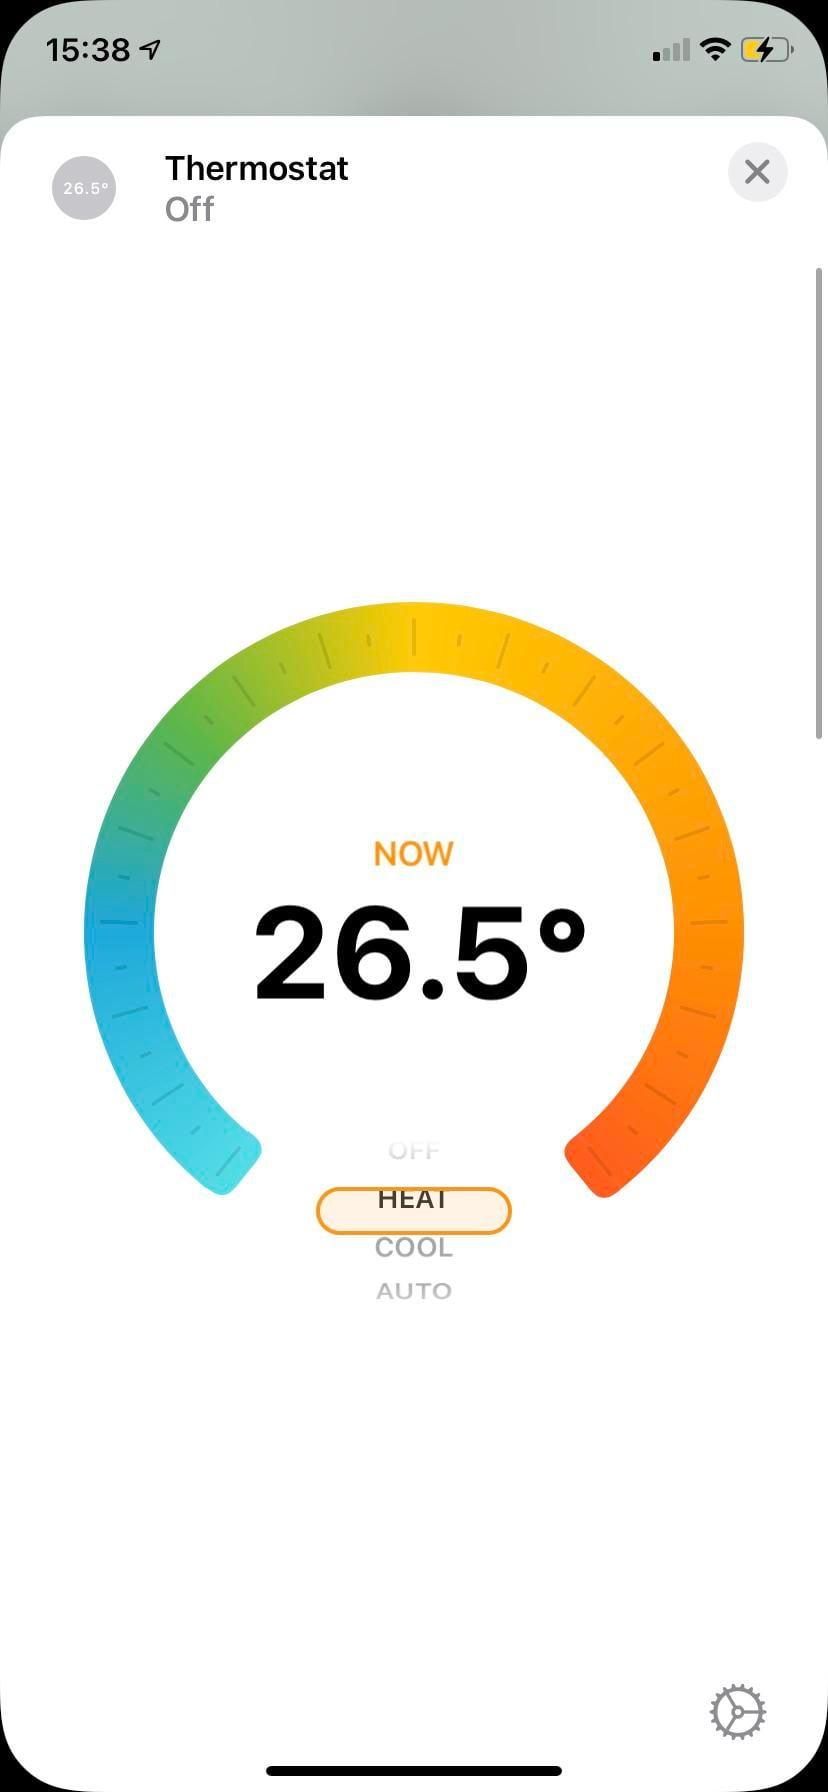 Can HomeKit activate the Ecobee fan